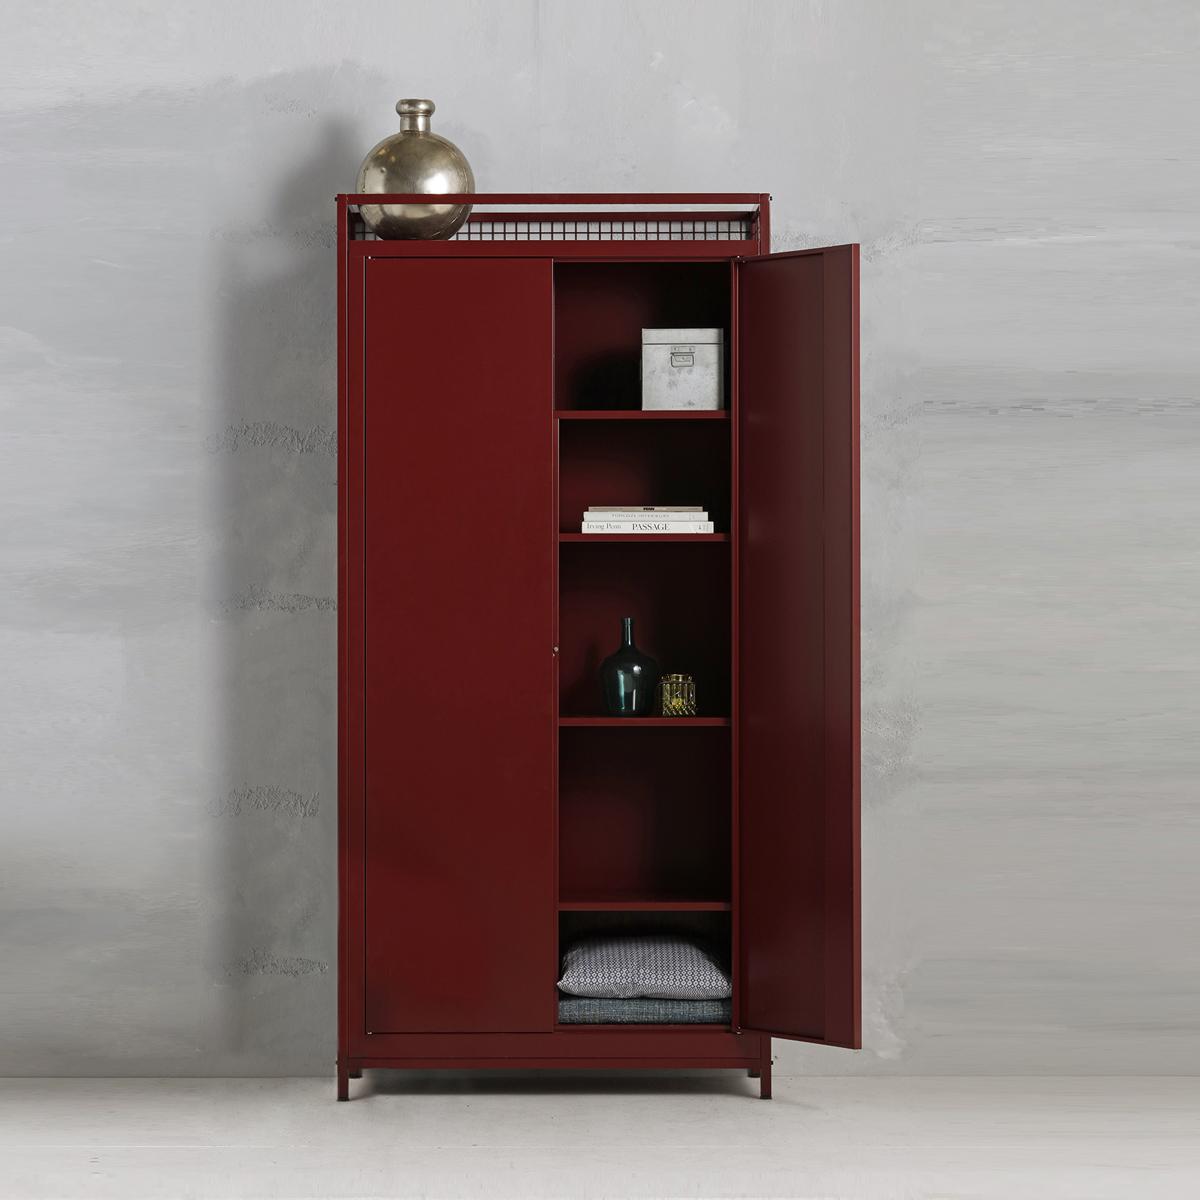 Industriële opbergkast - wijnrood - 220x105.3x44.5 cm - LCS-109